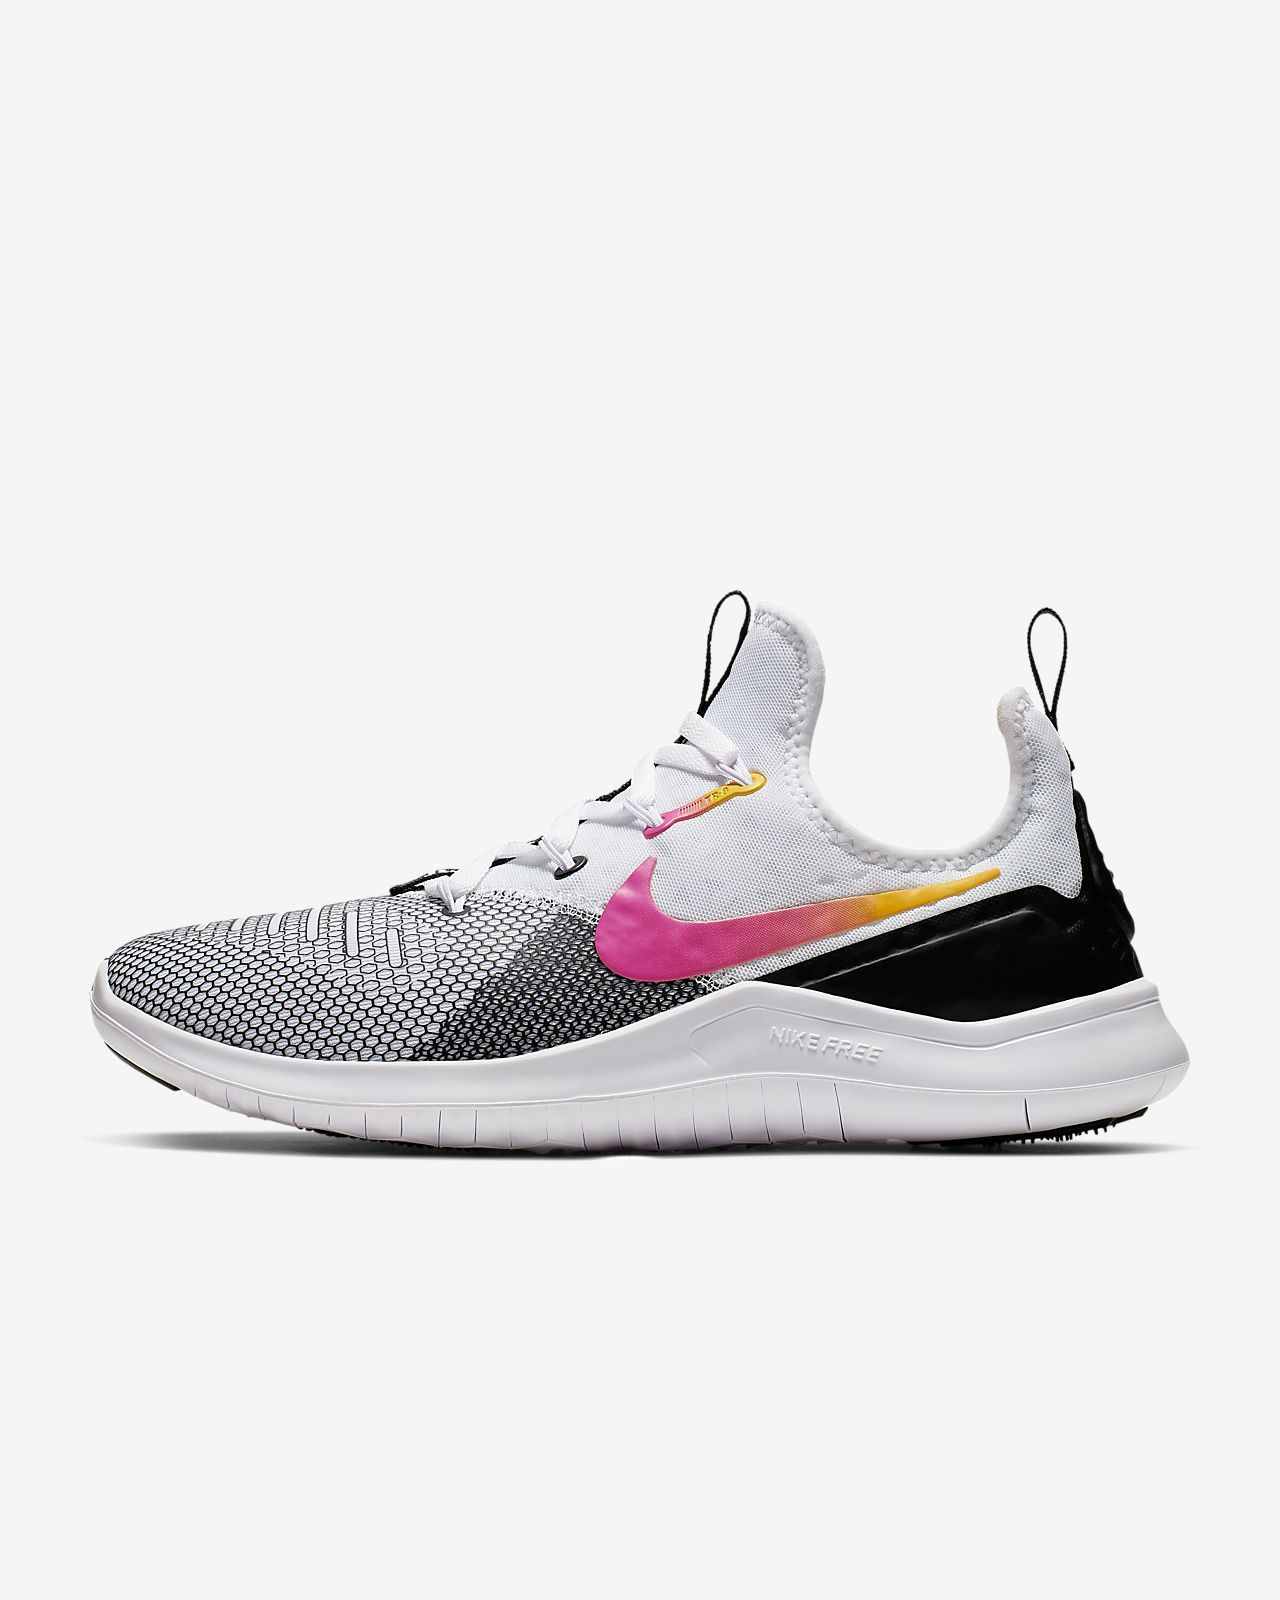 Gym/HIIT/Cross Training Shoe. Nike